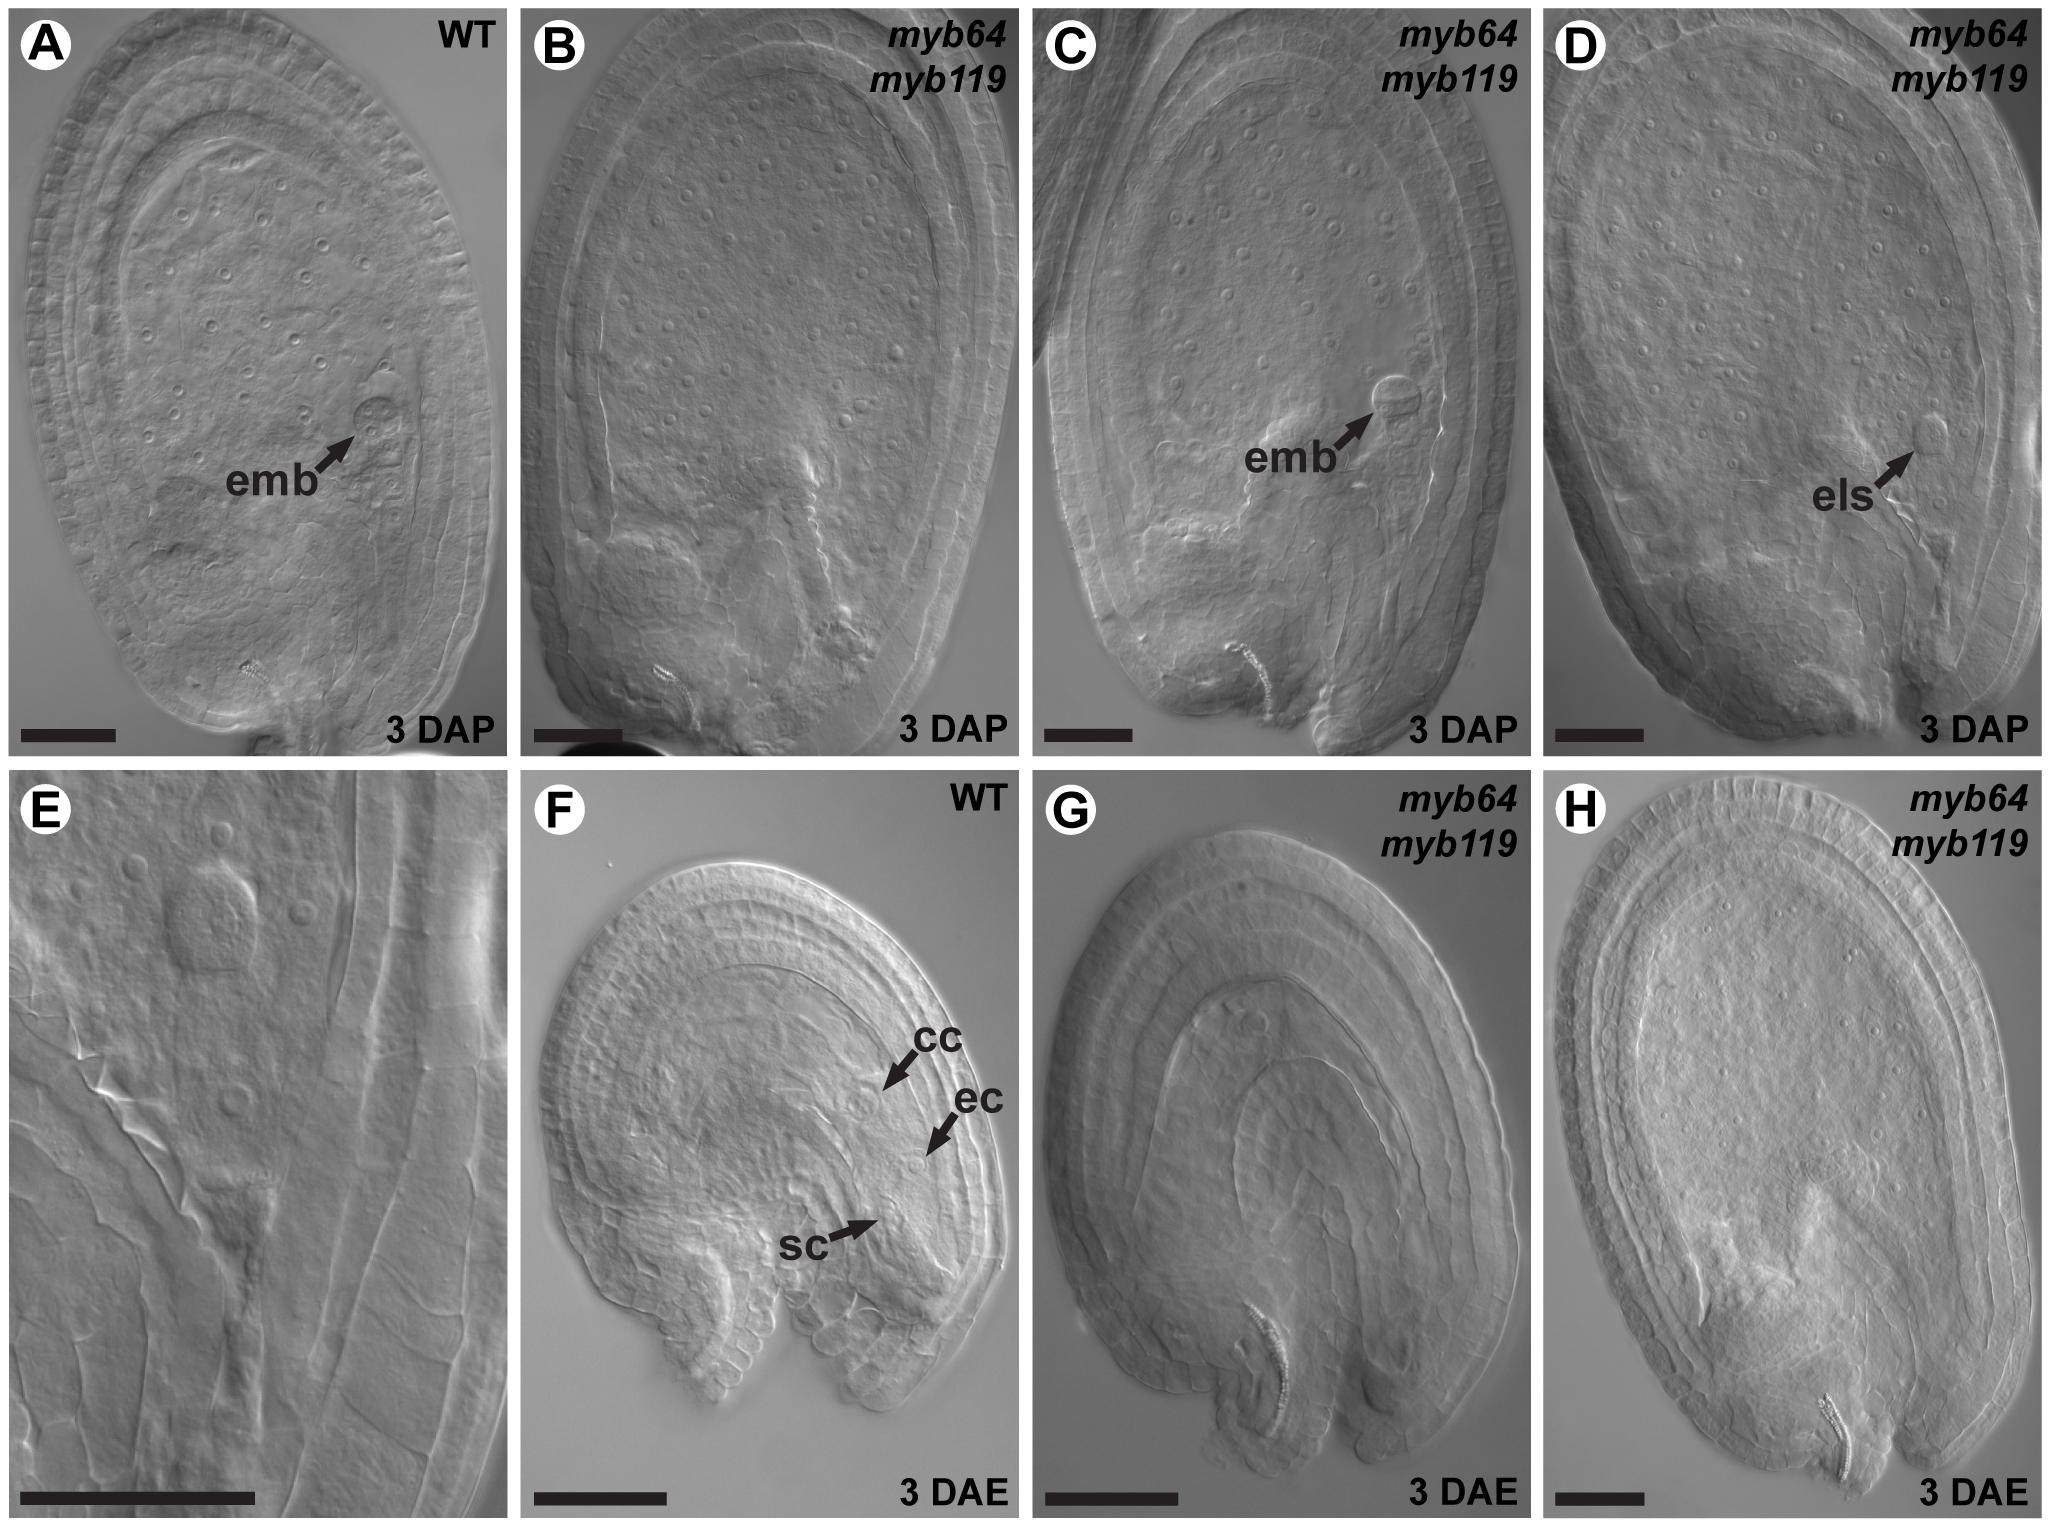 <i>myb64 myb119</i> gametophytes initiate autonomous endosperm development.